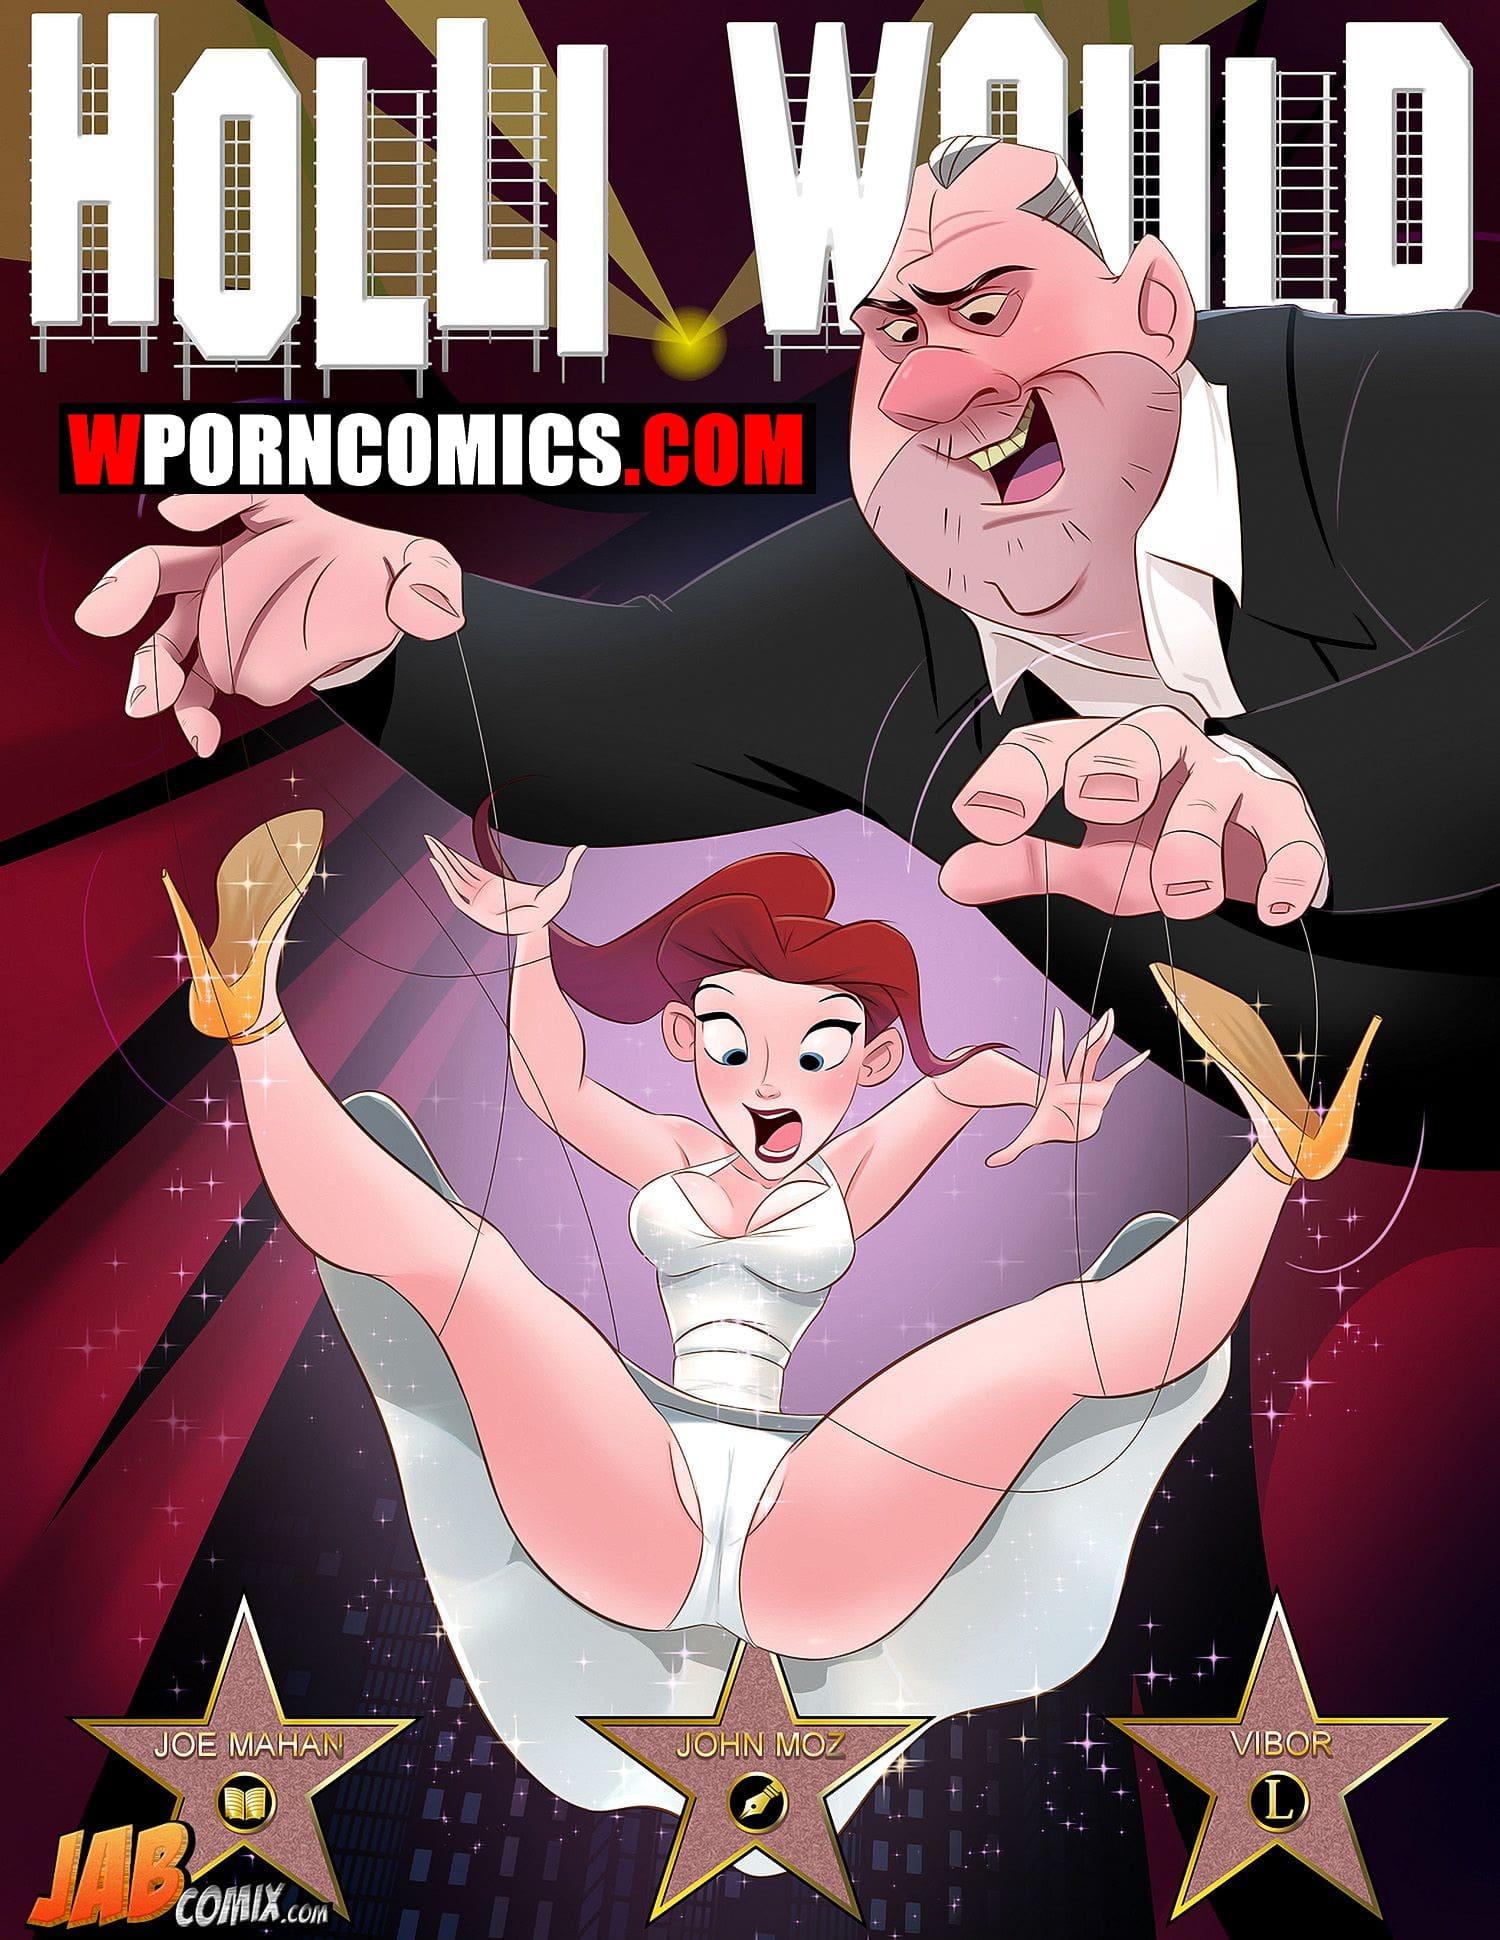 Adult comic pron porno photo